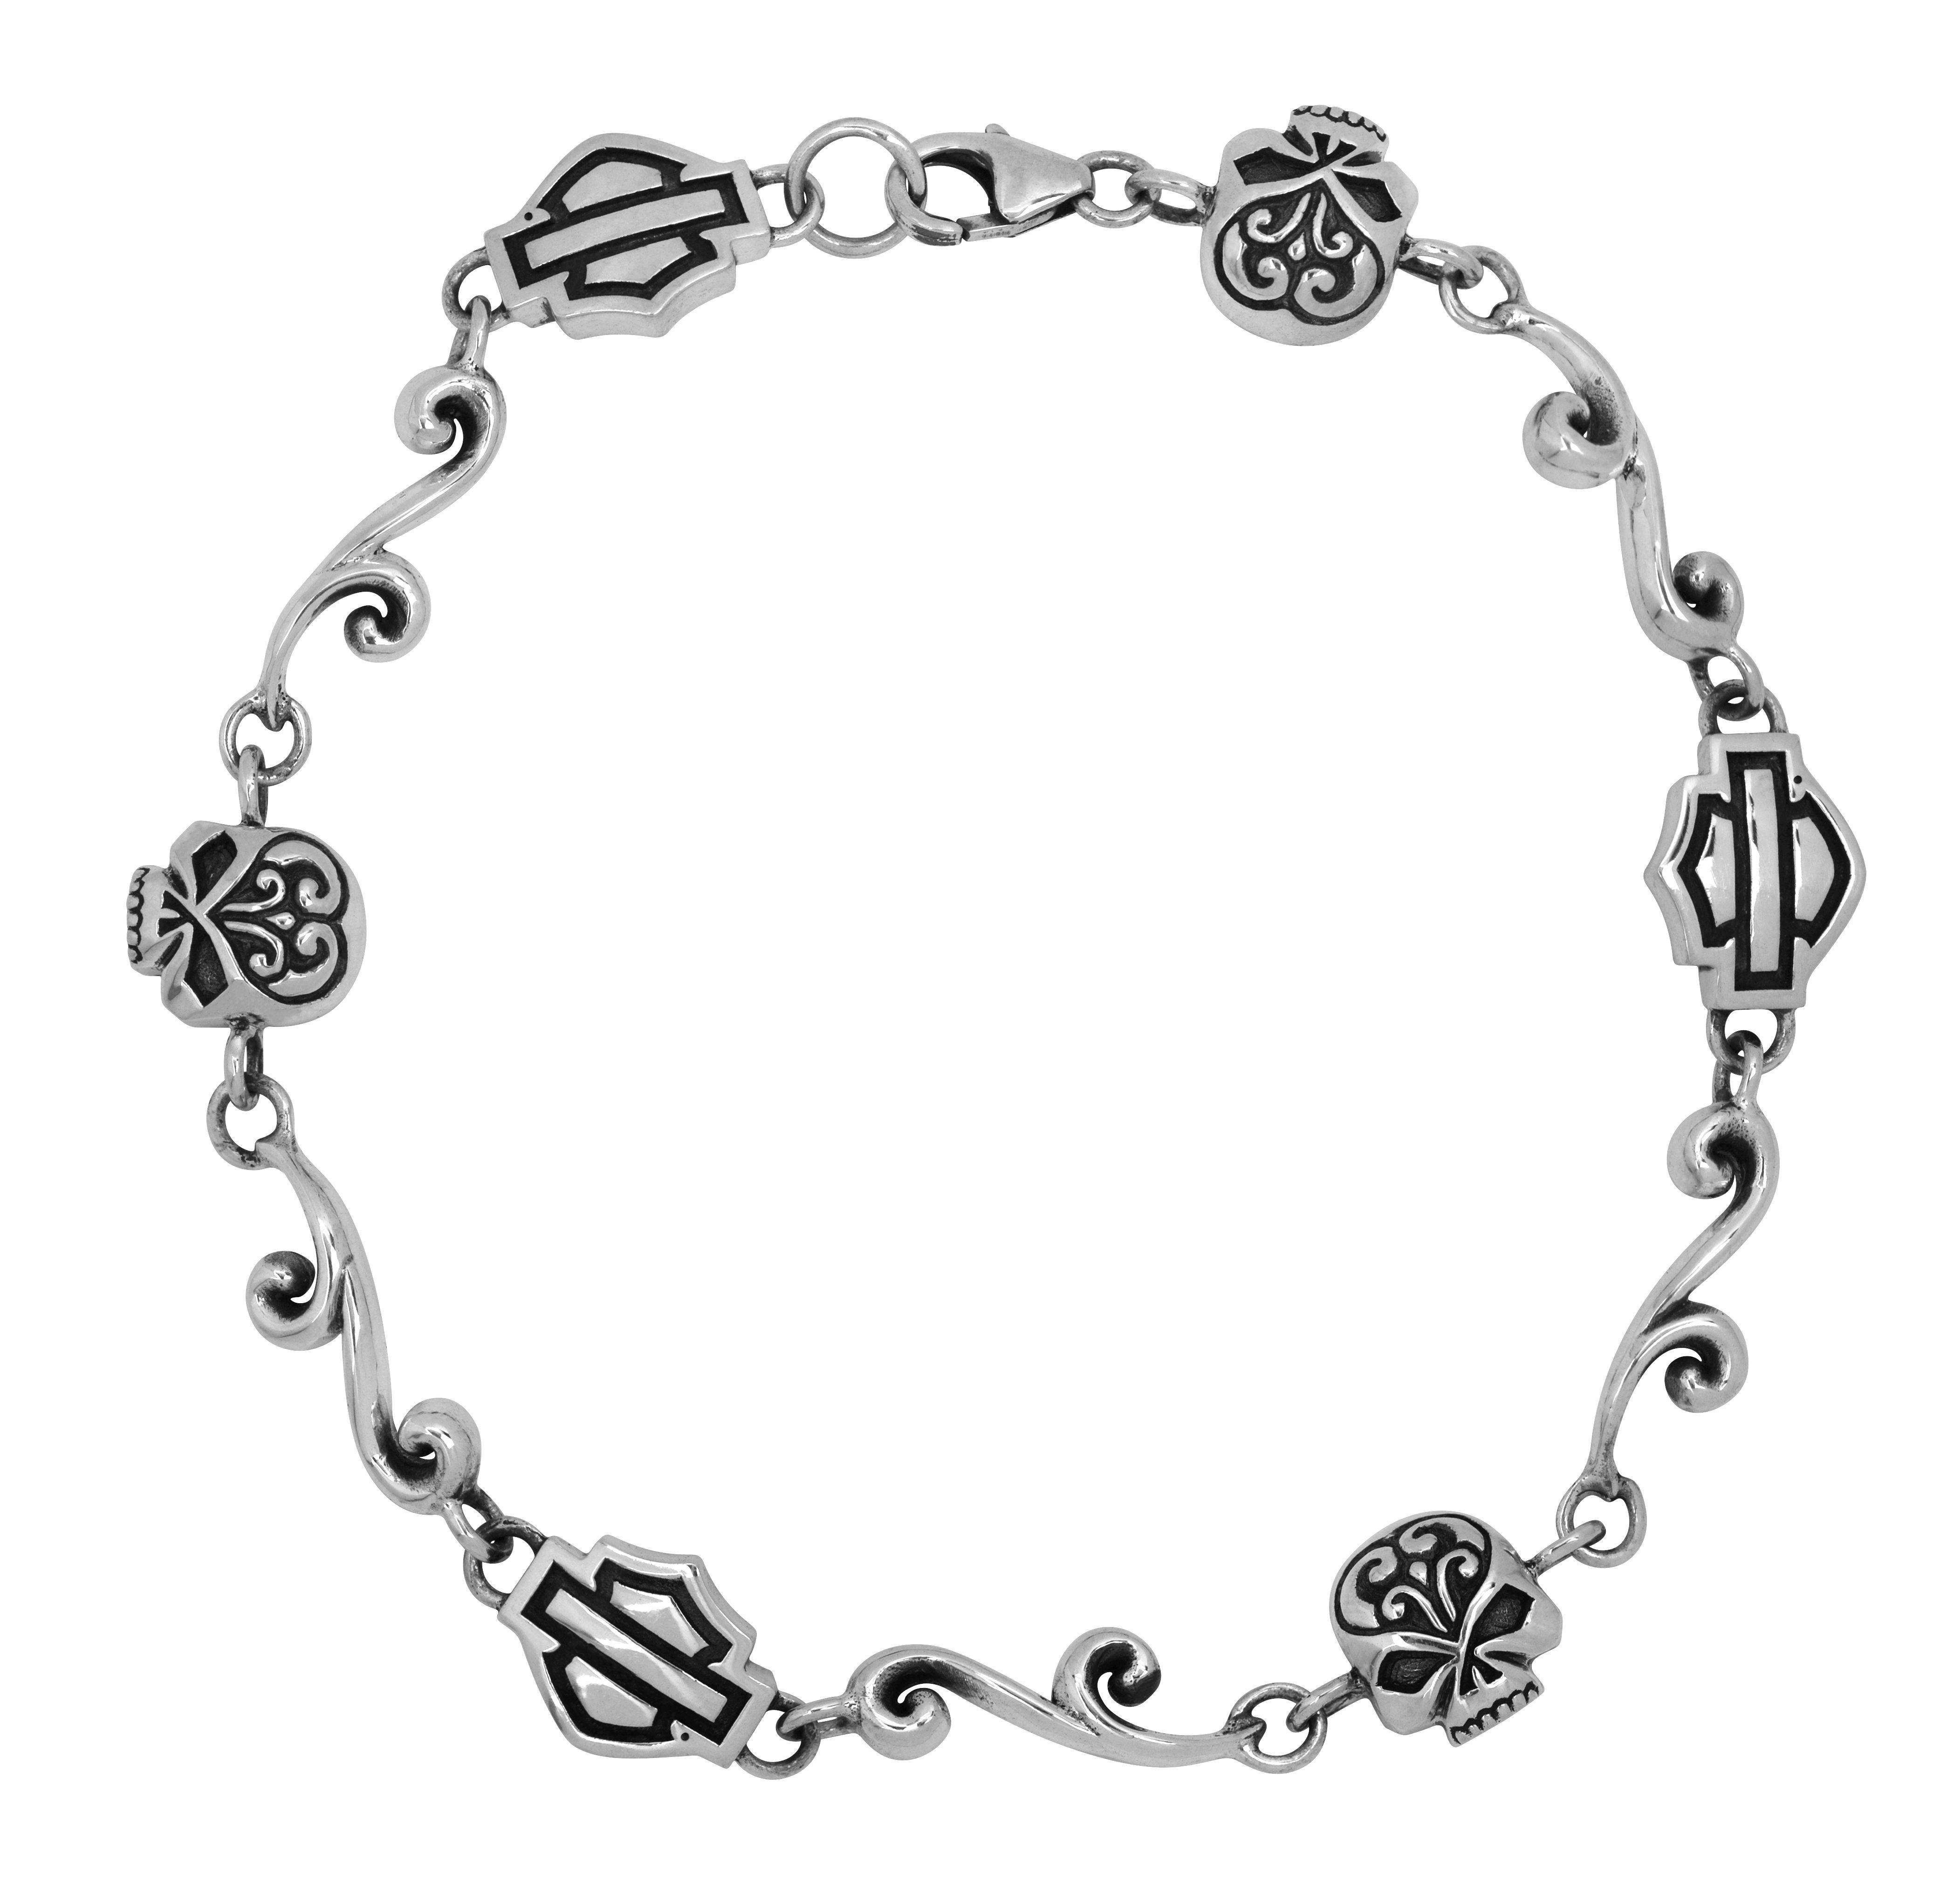 harley davidson wedding bands harley jewelry for women Harley Davidson Womens Silver Filigree Skull Chain